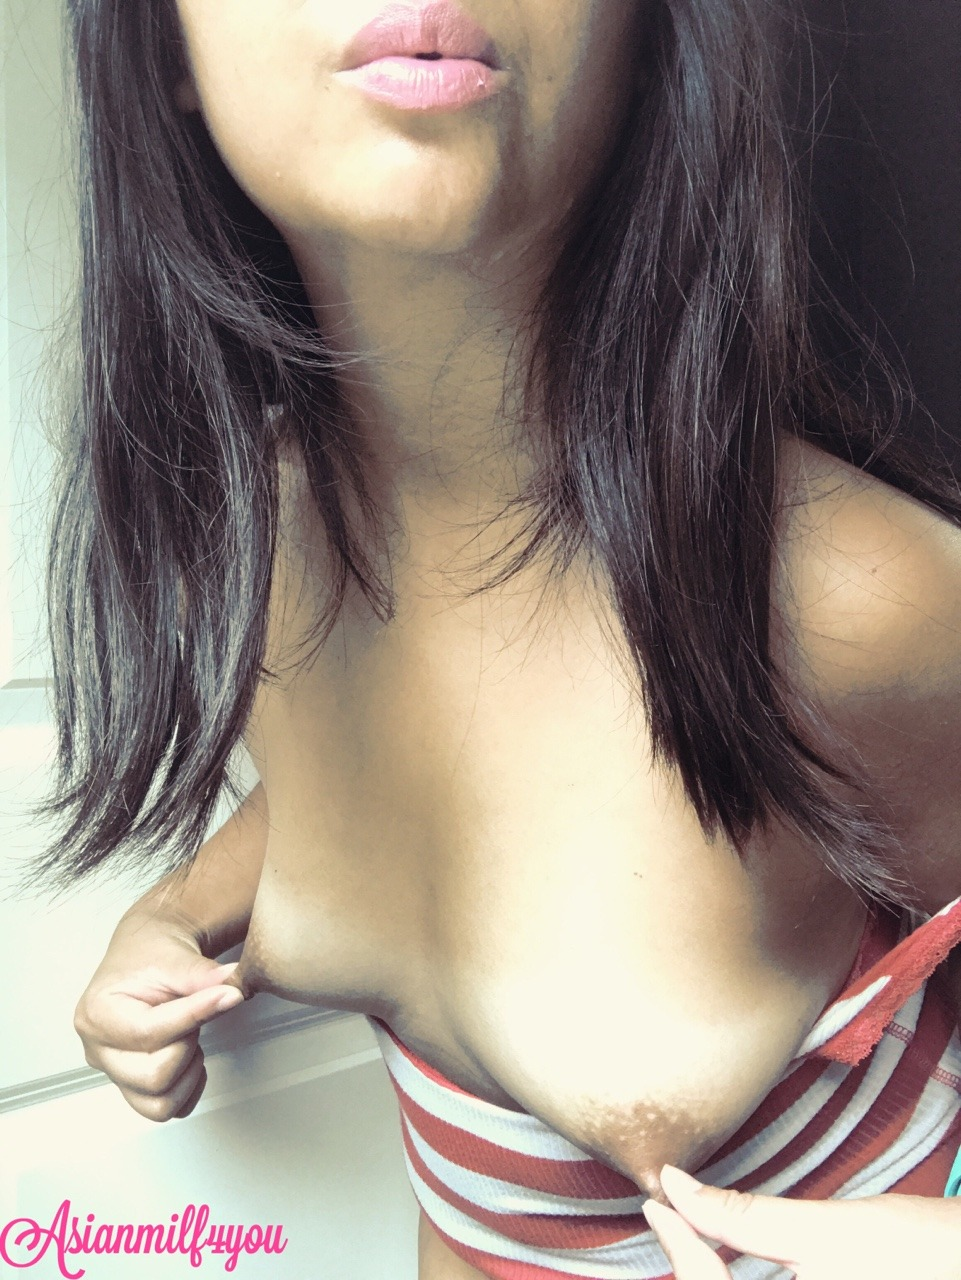 Sexcams nerdy asian girl  free sex waif tit big tits